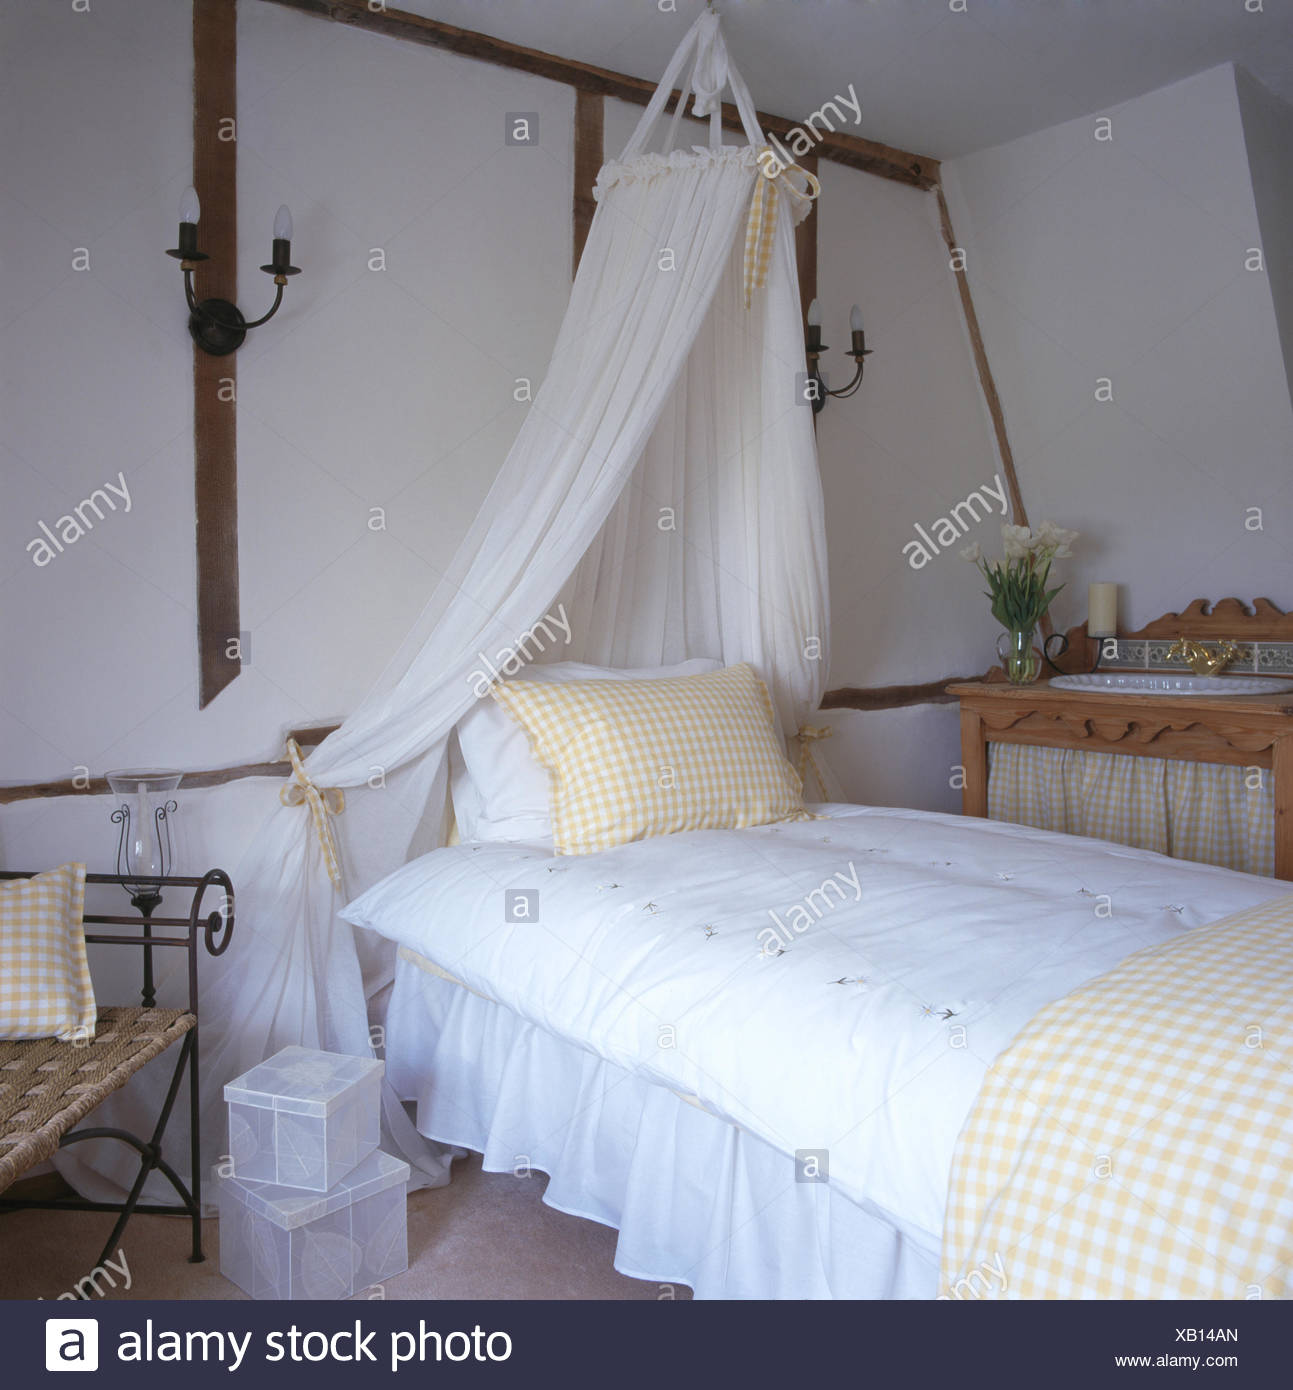 Spencer Hastings Bedroom Wallpaper Bedroom Upholstered Headboard Little Boy Bedroom Sets Bedroom Decor Neutral: Interiors Bedroom Curtains Nineties Stock Photos